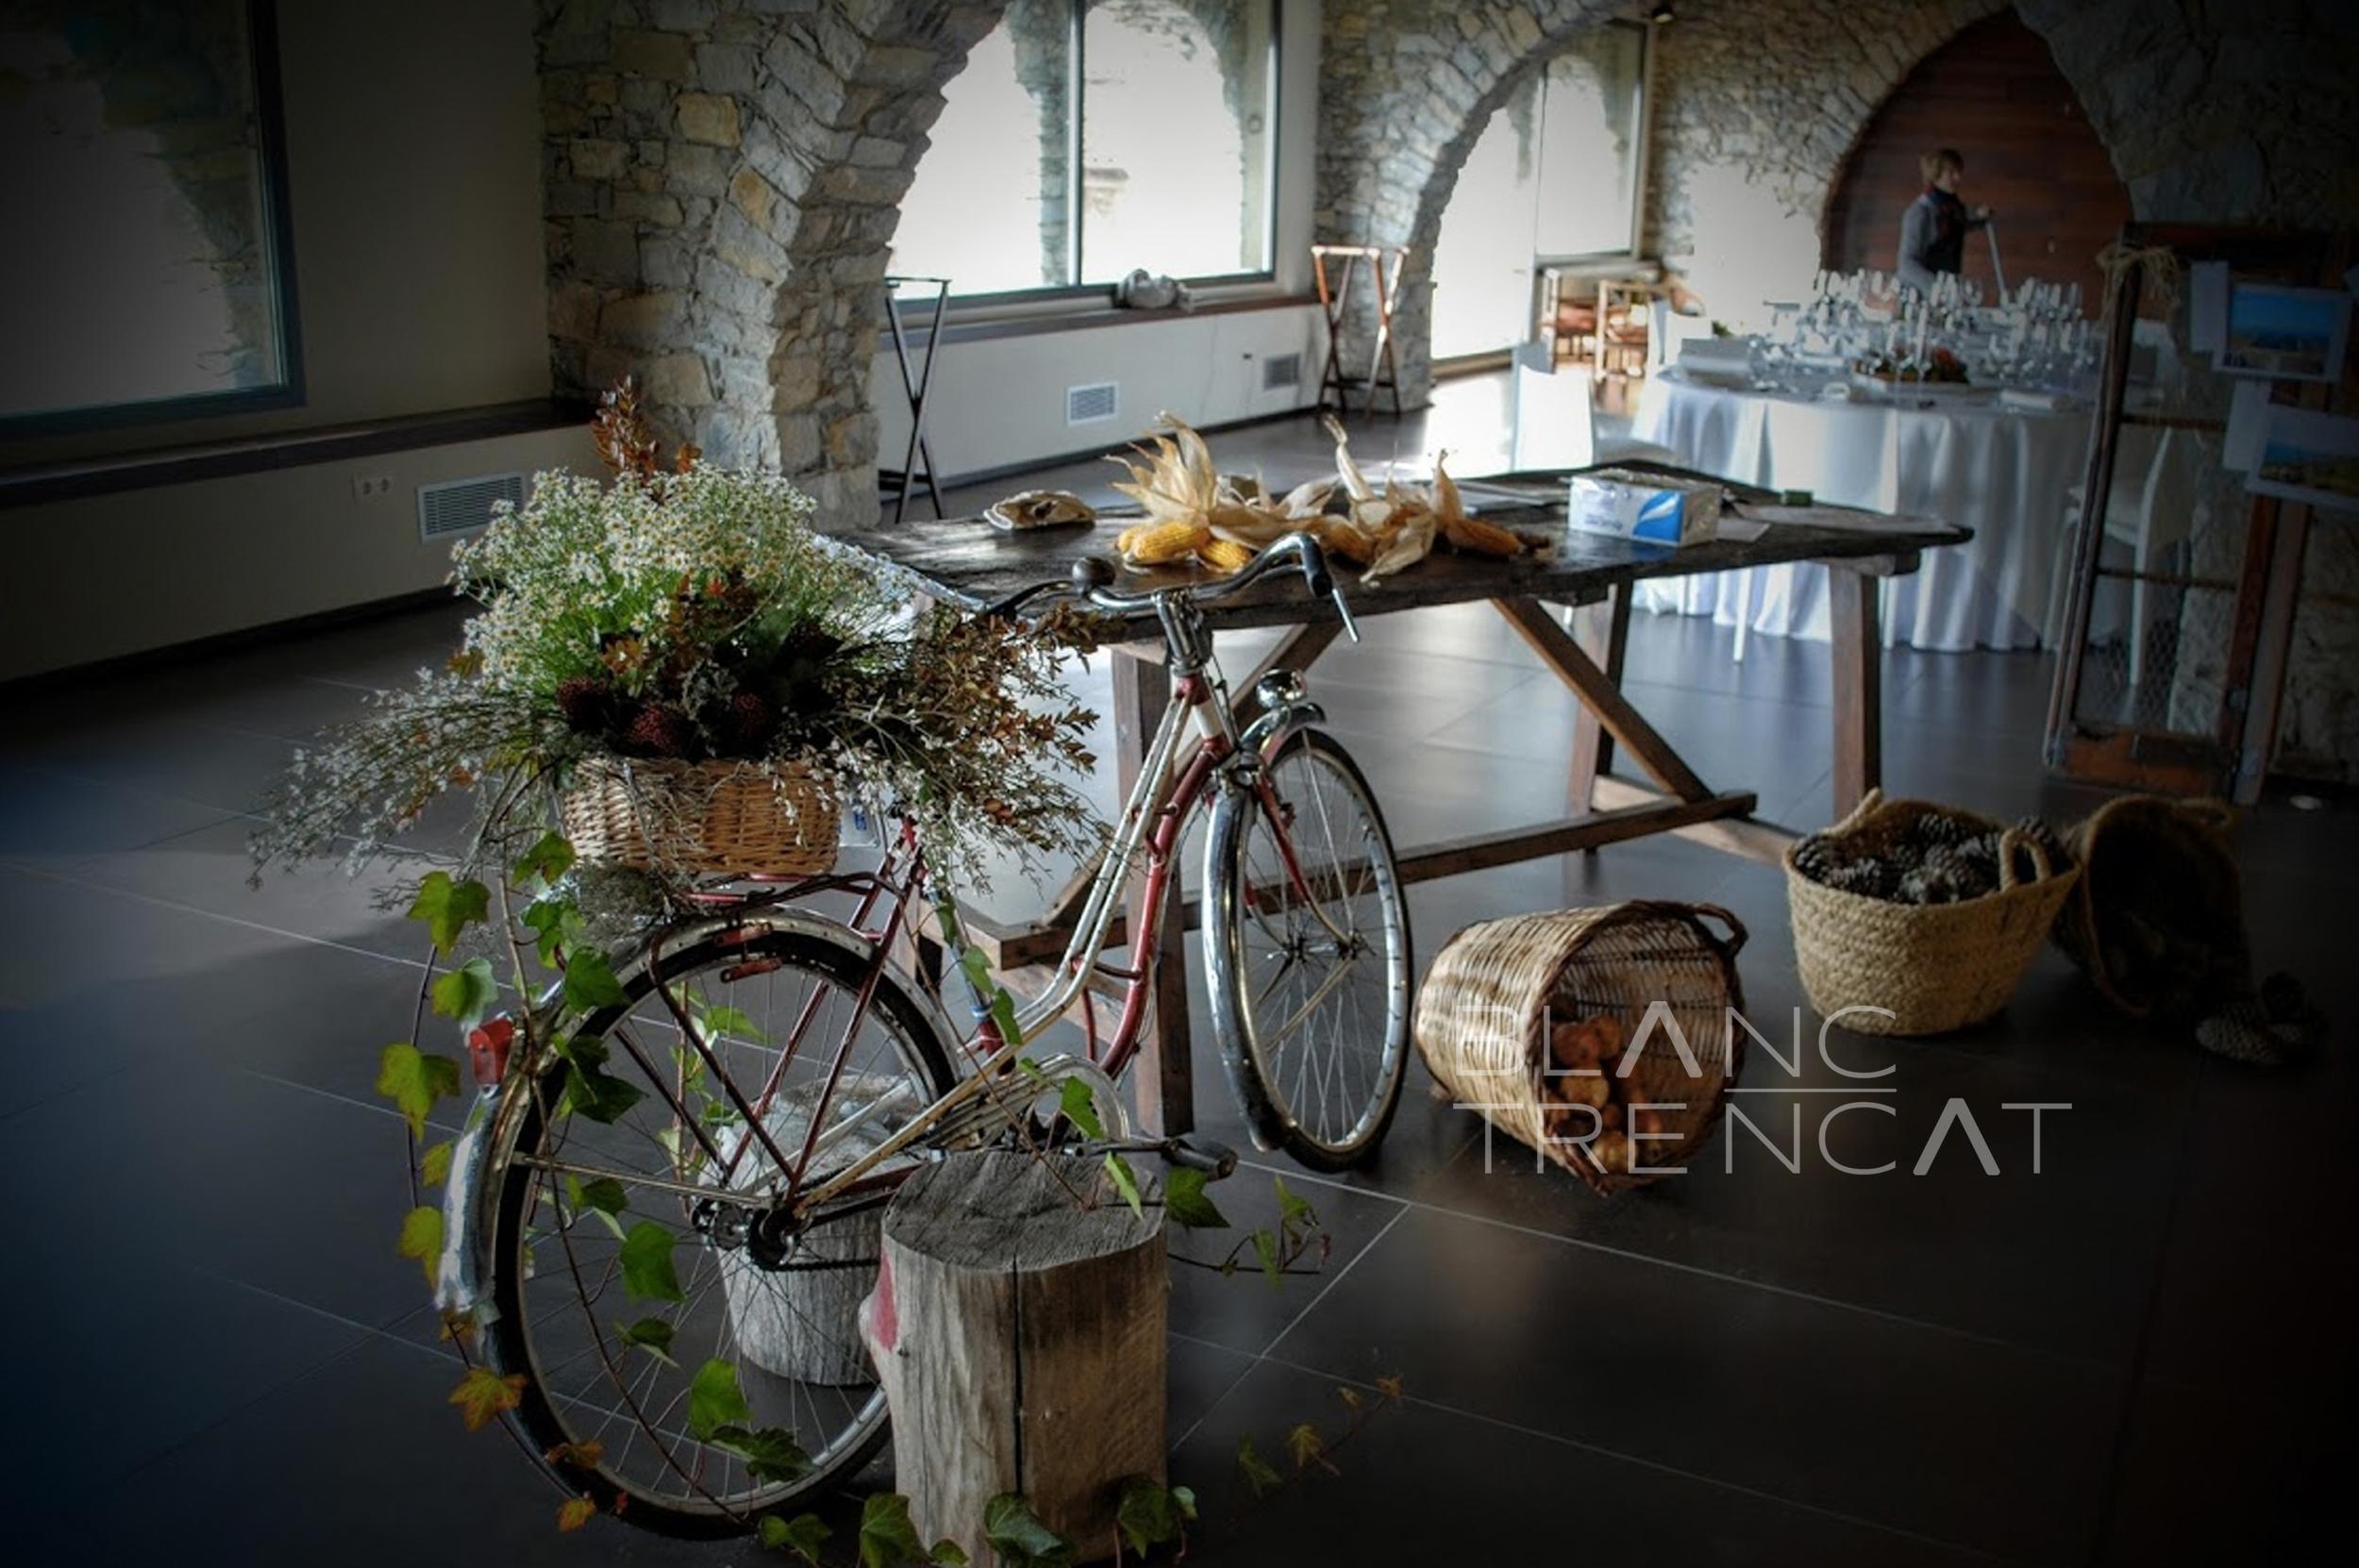 decoracion_boda_blanctrencat3.jpg